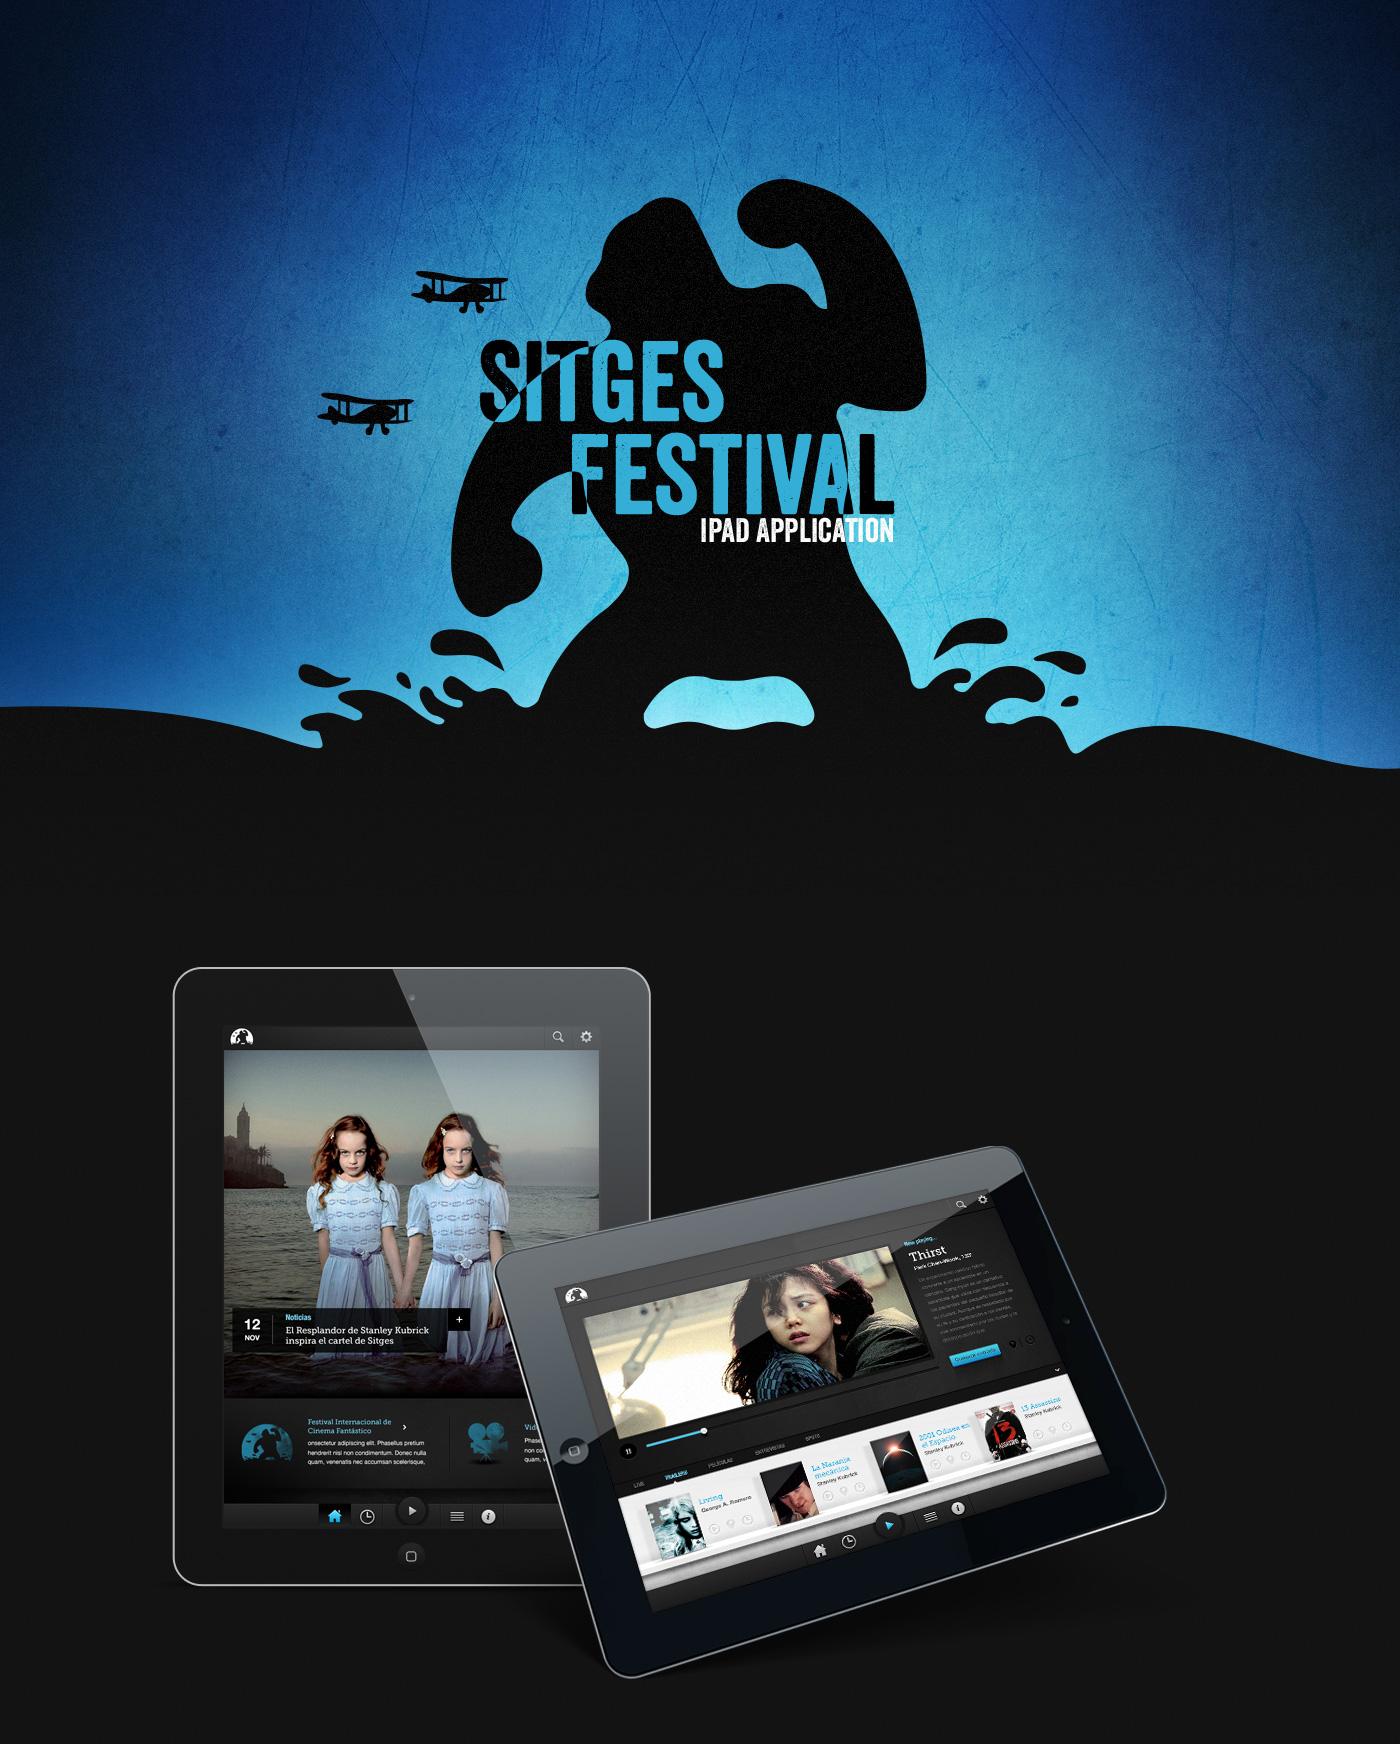 ipad_festival_sitge_01